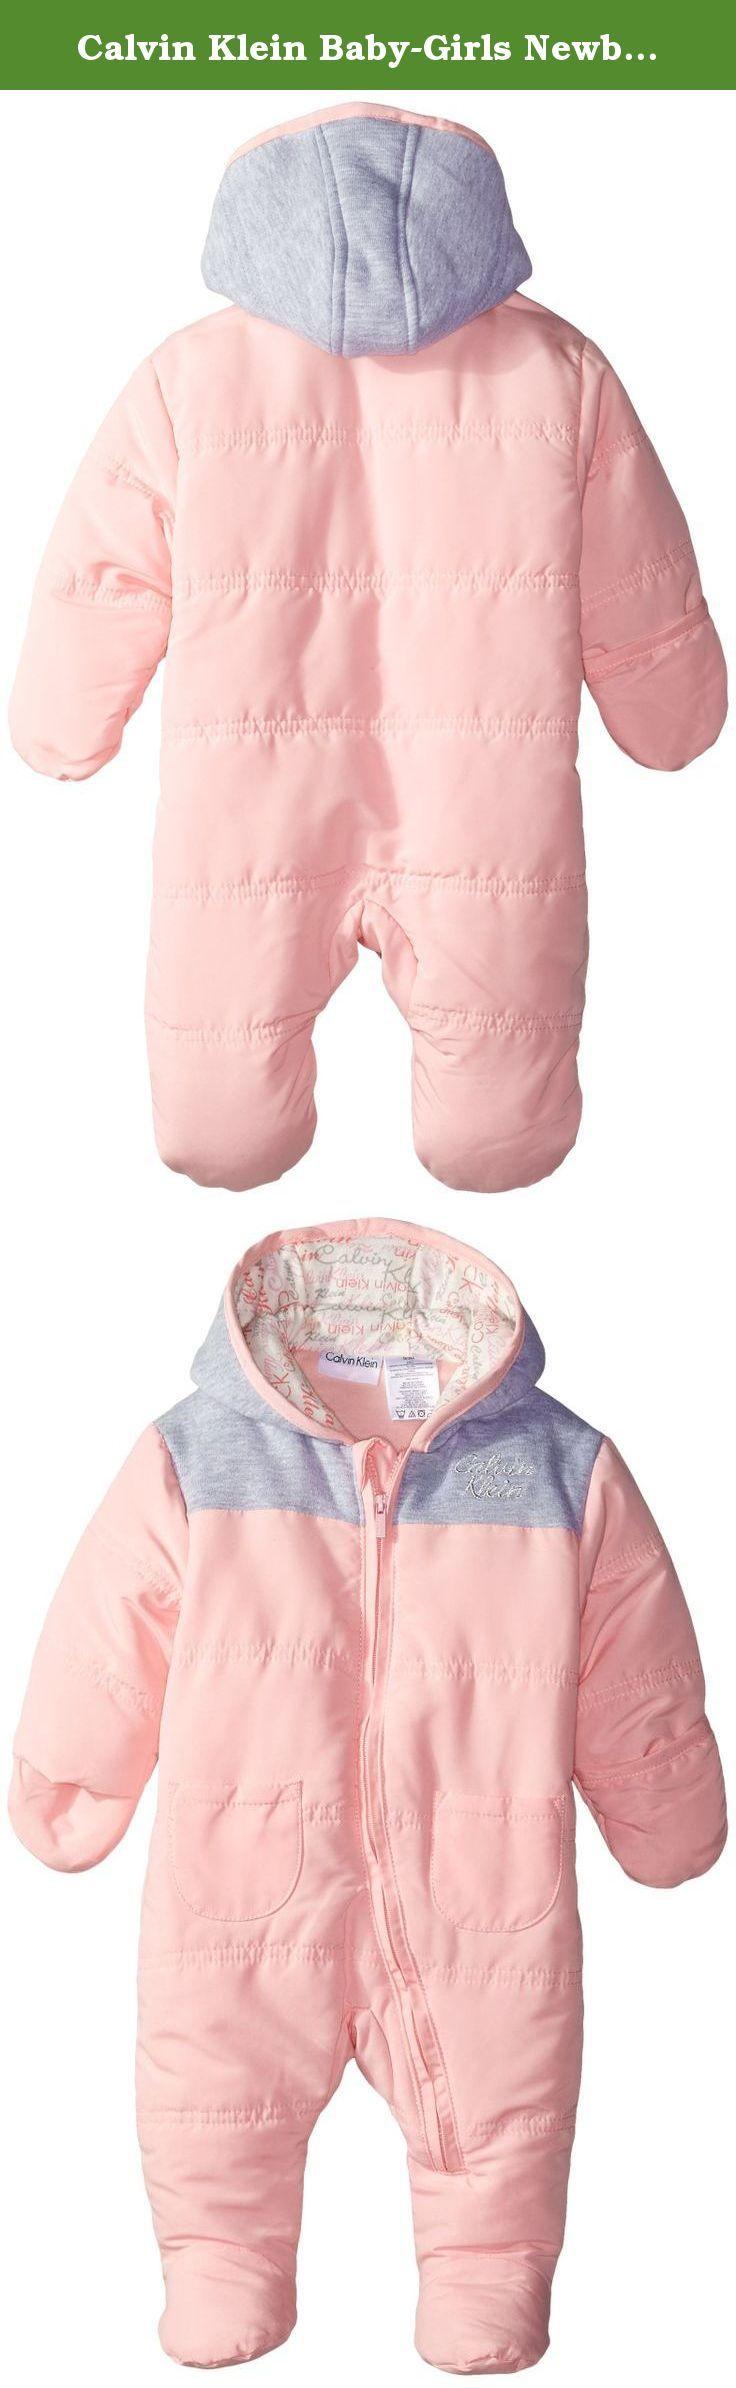 Calvin Klein Baby-Girls Newborn Hooded Gray Pink Pram, Gray/Pink, 0-3 Months. Pram.